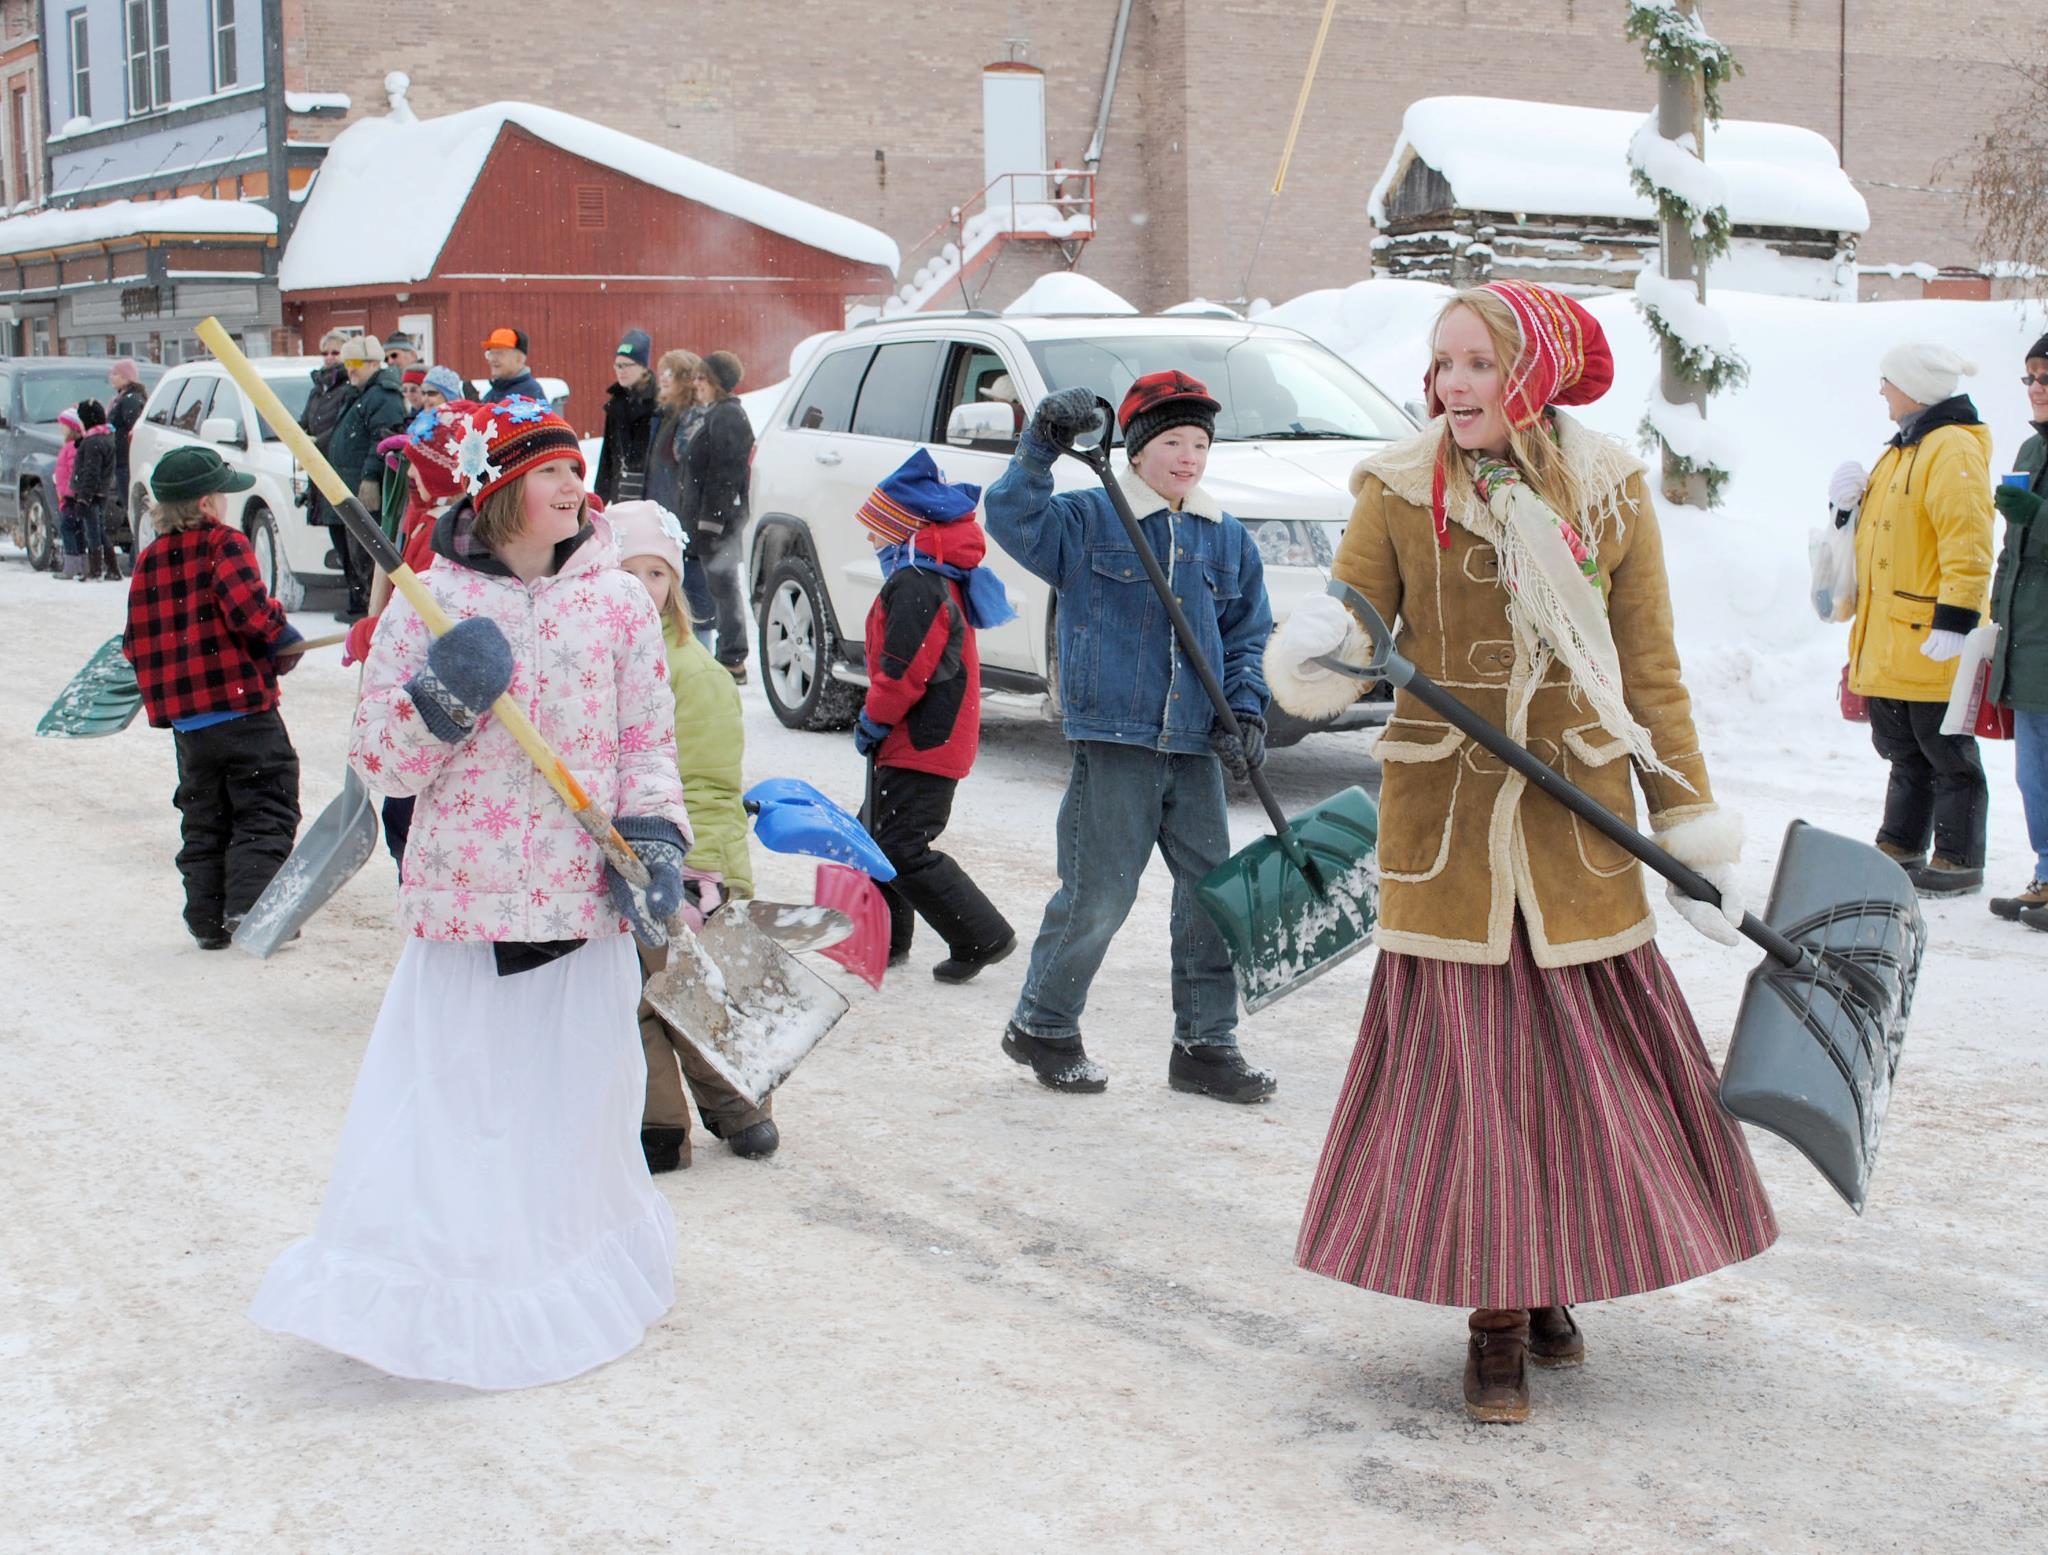 Heikinpäivä 2018 - Finnish-American Winter Festival in Hancock, Michigan